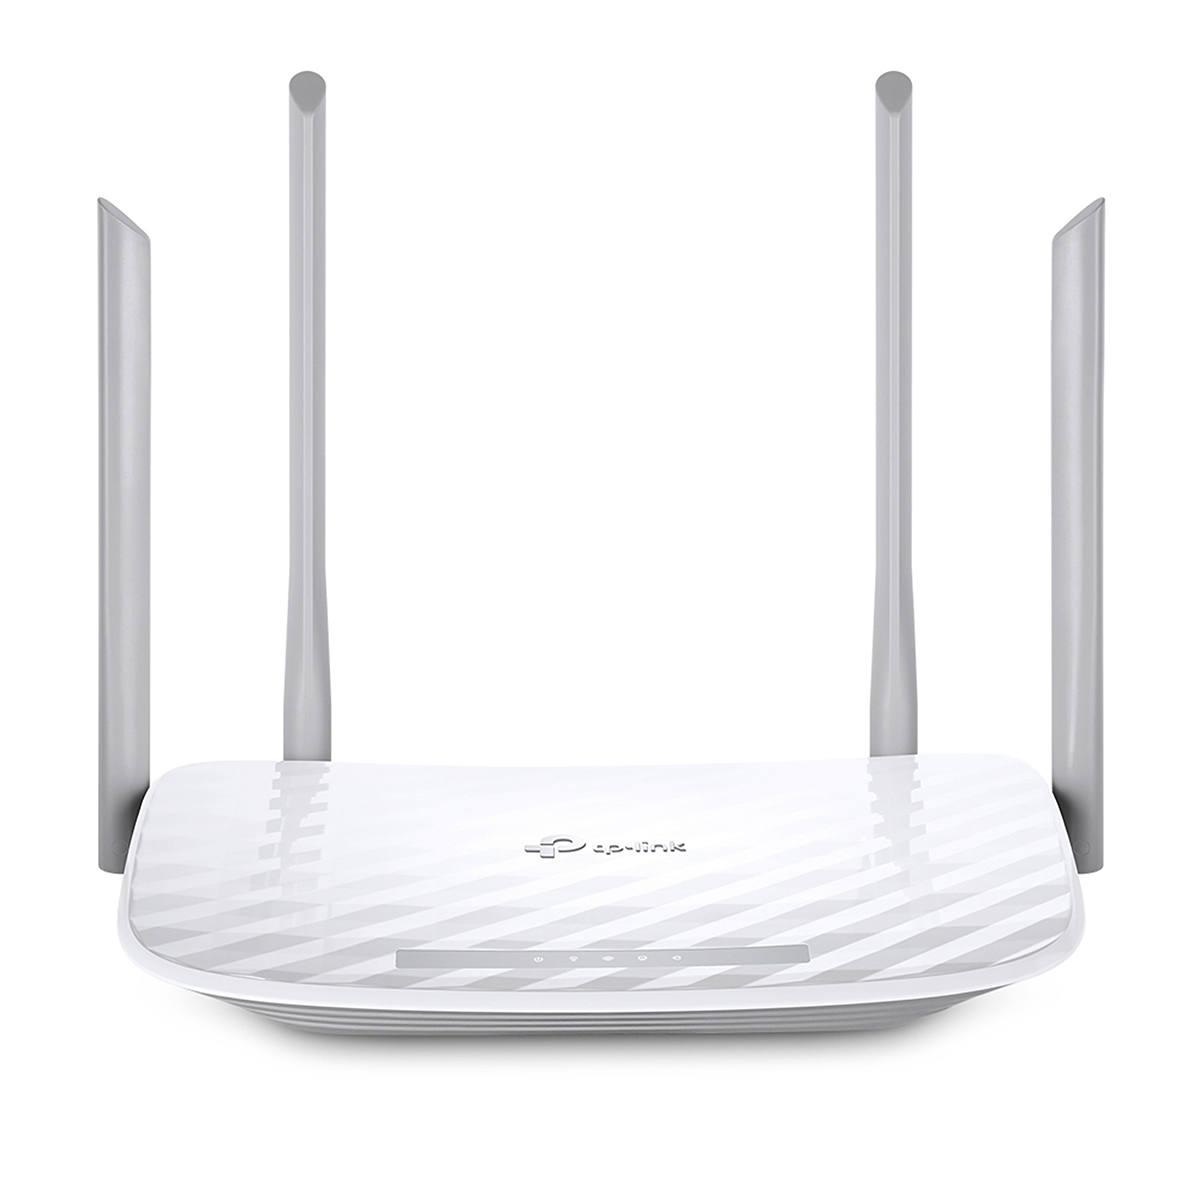 Roteador Wireless AC1200 TP-Link Archer C50 Dual Band Wi-Fi 867 Mbps + 300 Mbps 4 Antenas Multi-Modo 3 em 1